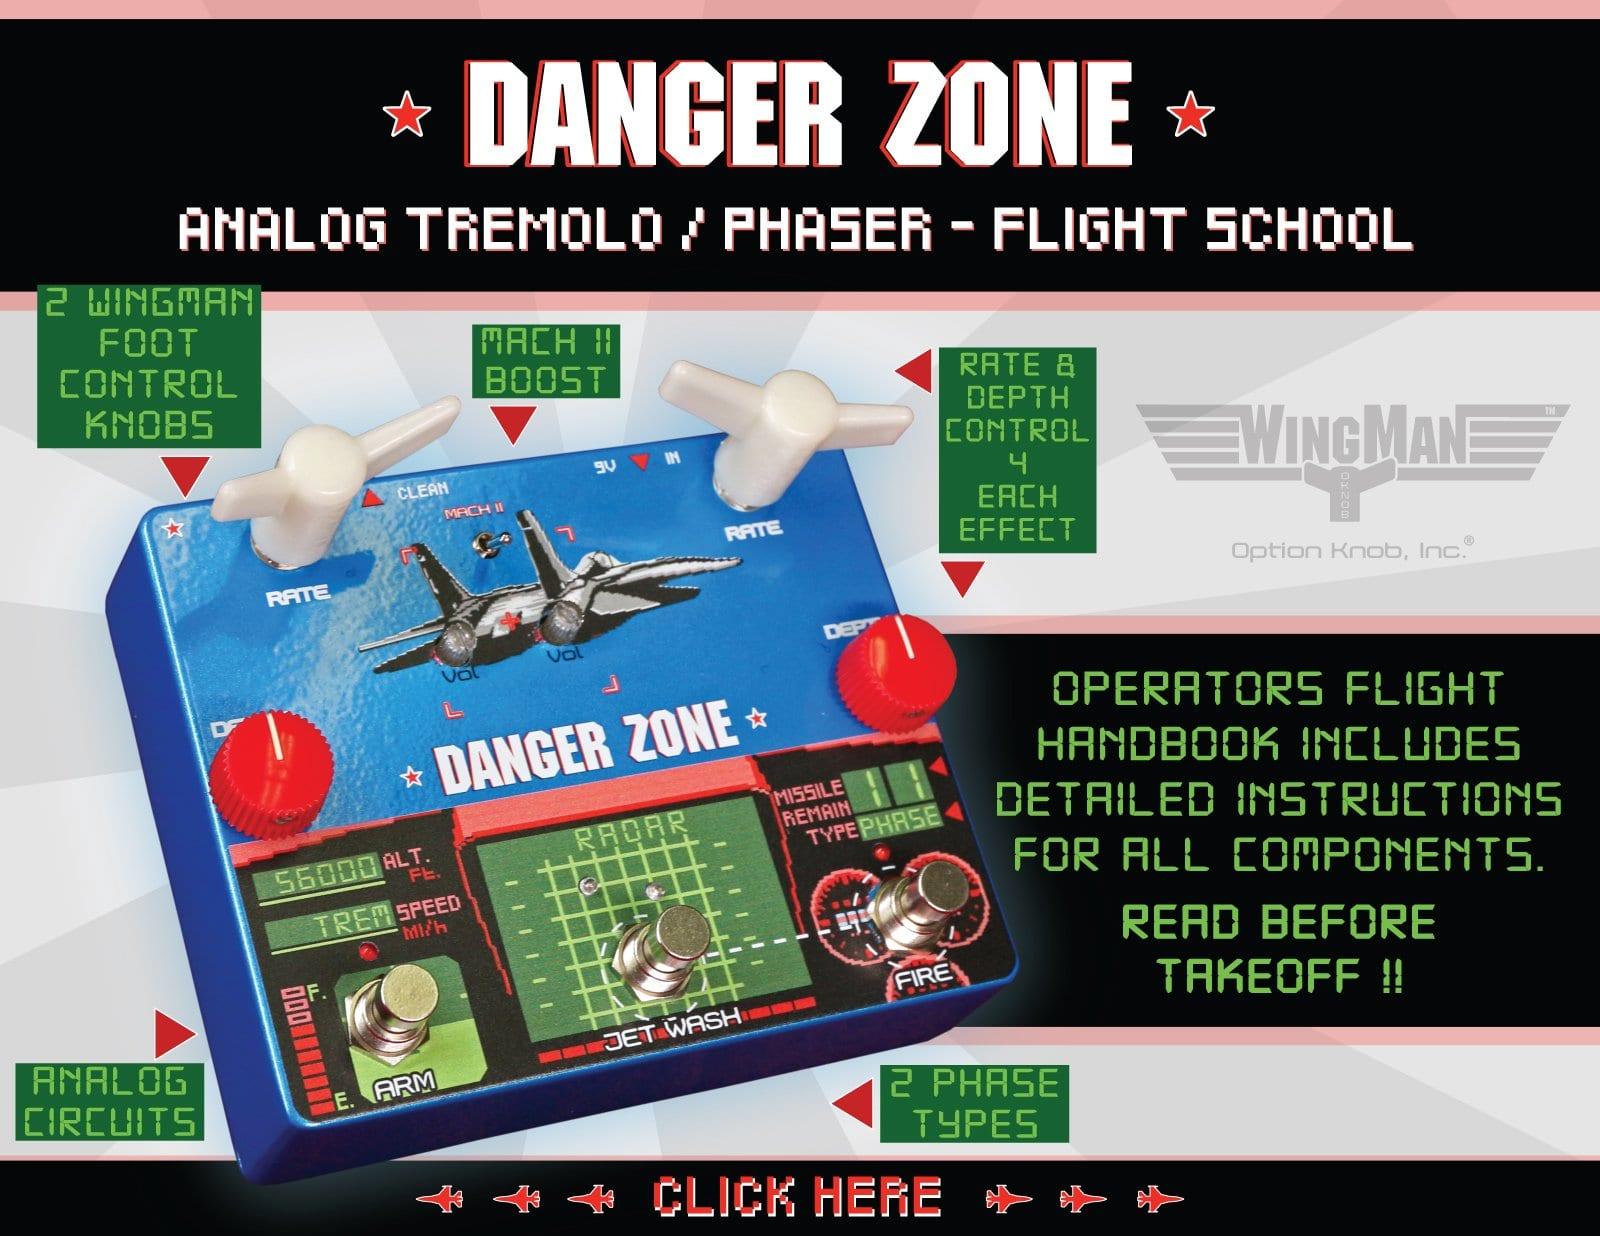 Option Knob Danger Zone WingMan